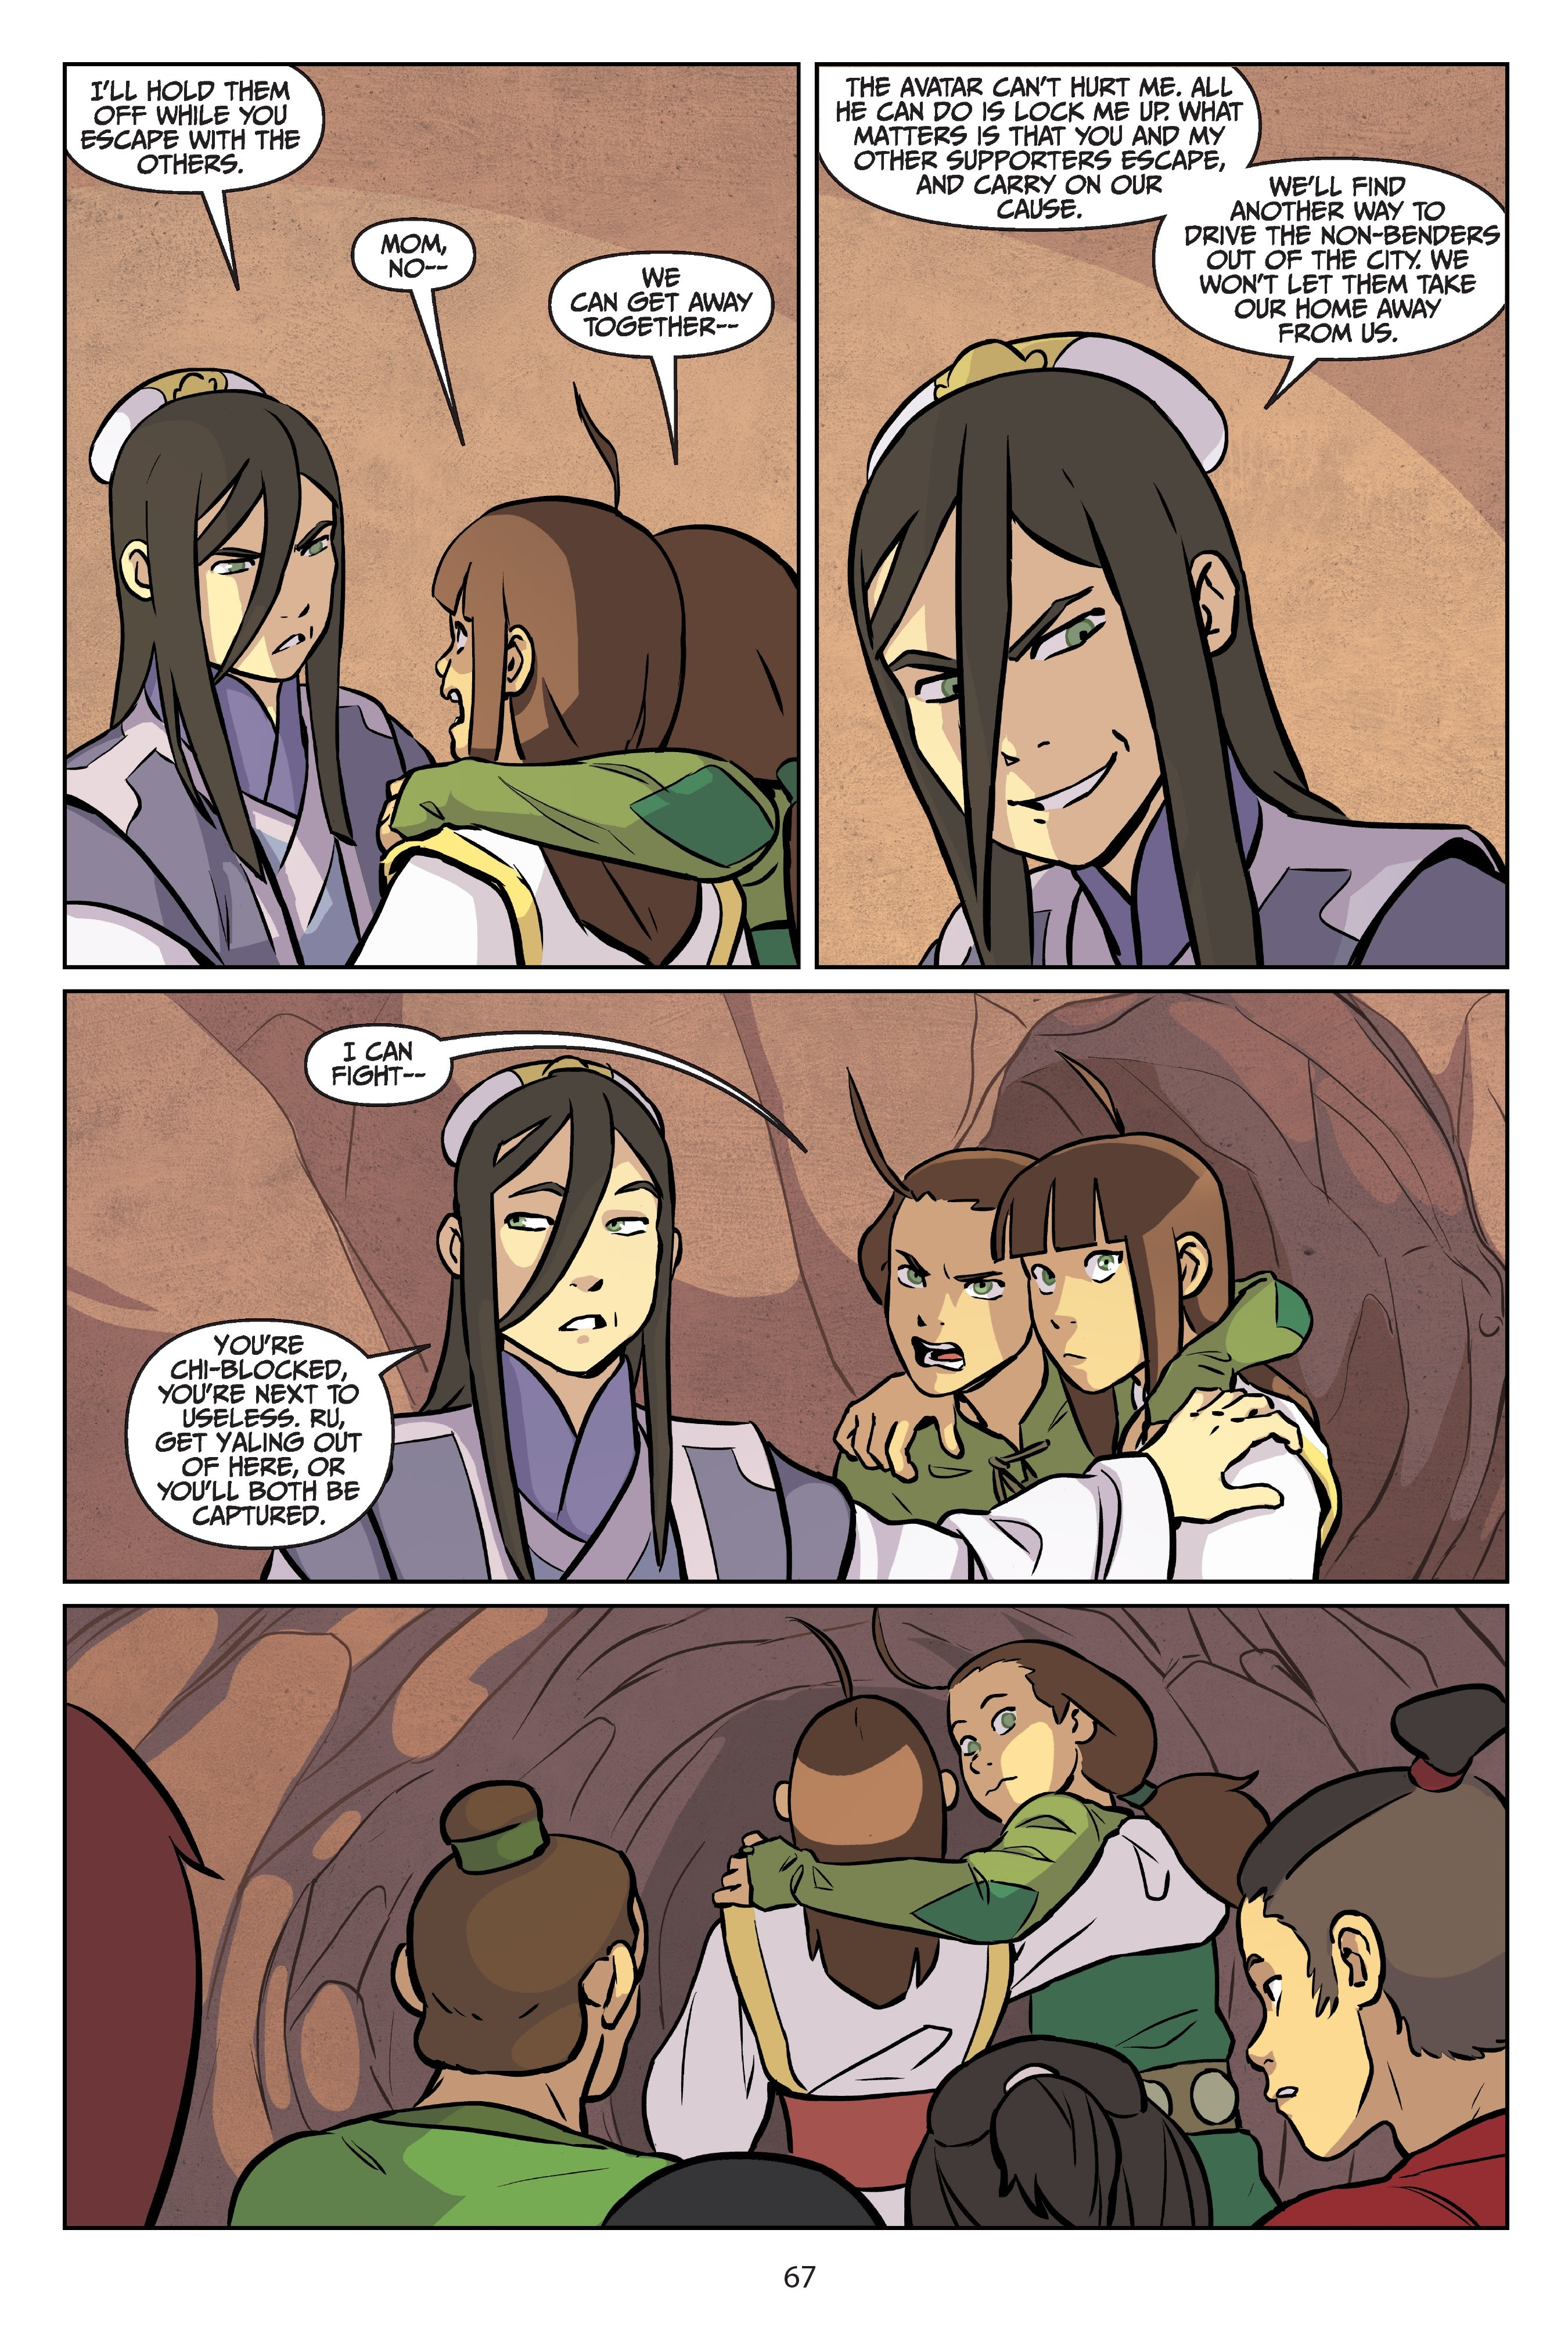 Nickelodeon Avatar: The Last Airbender - Imbalance TPB_2 Page 67